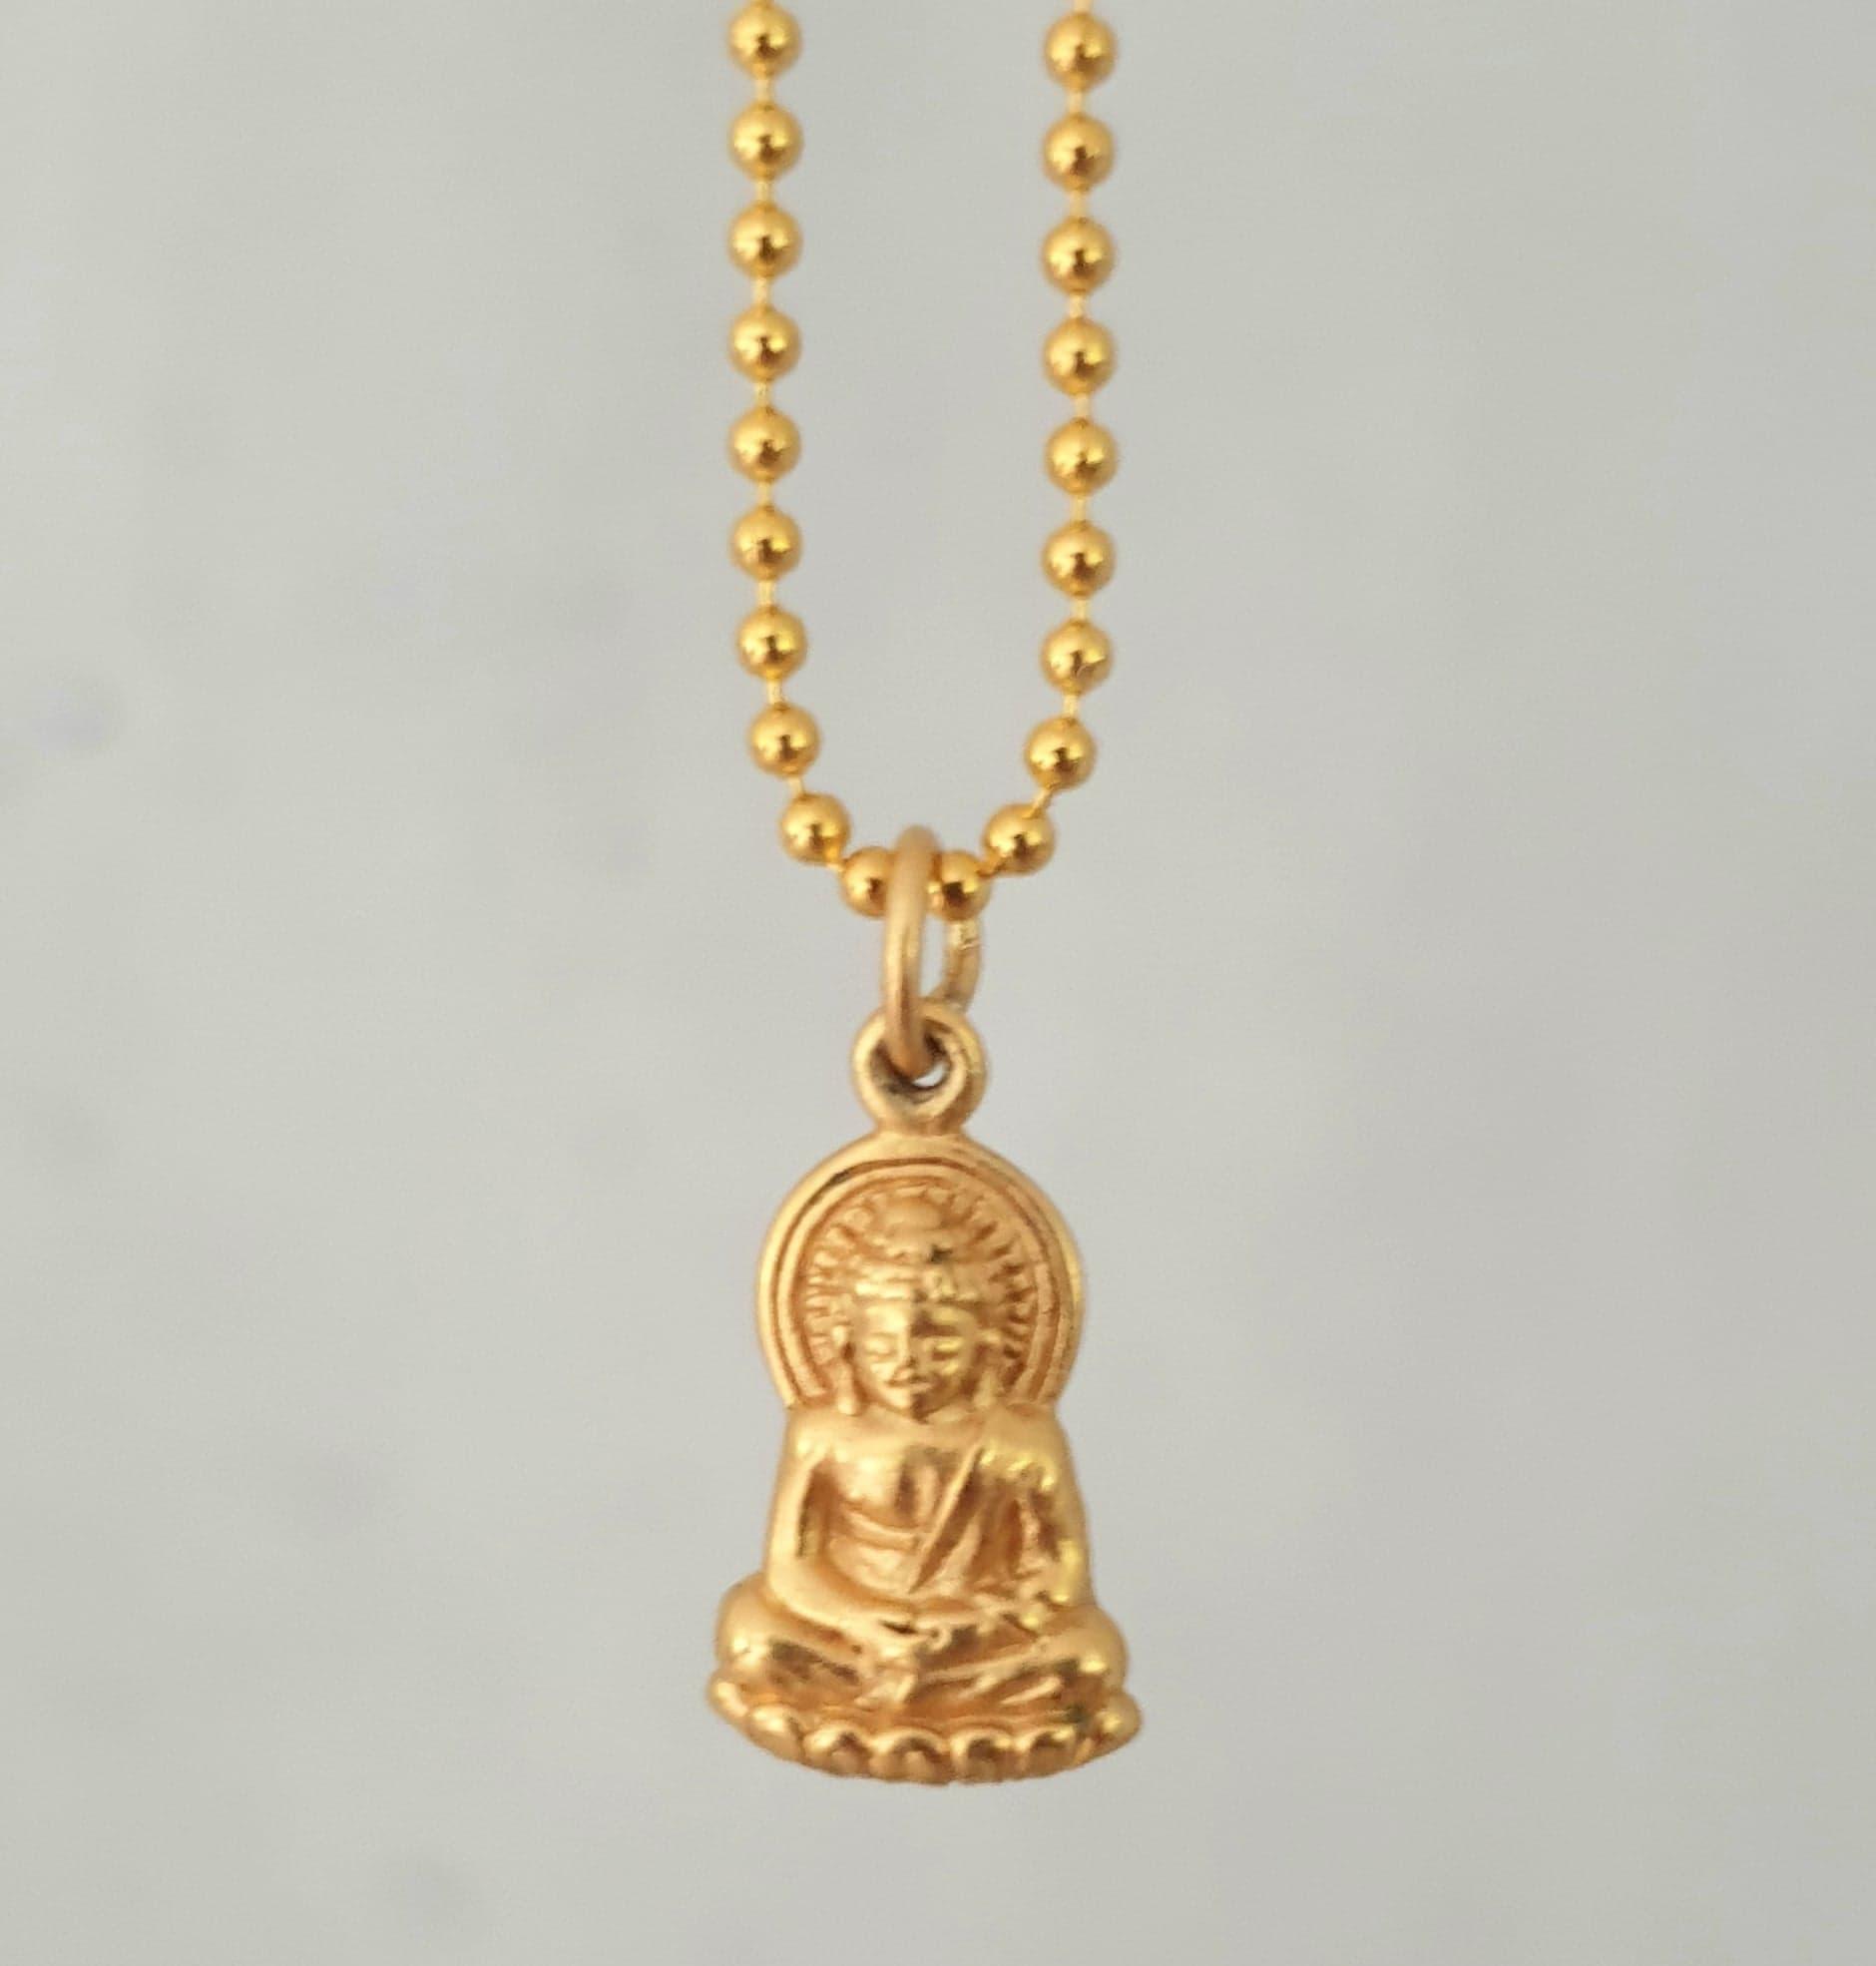 Kugle kæde med Buddha